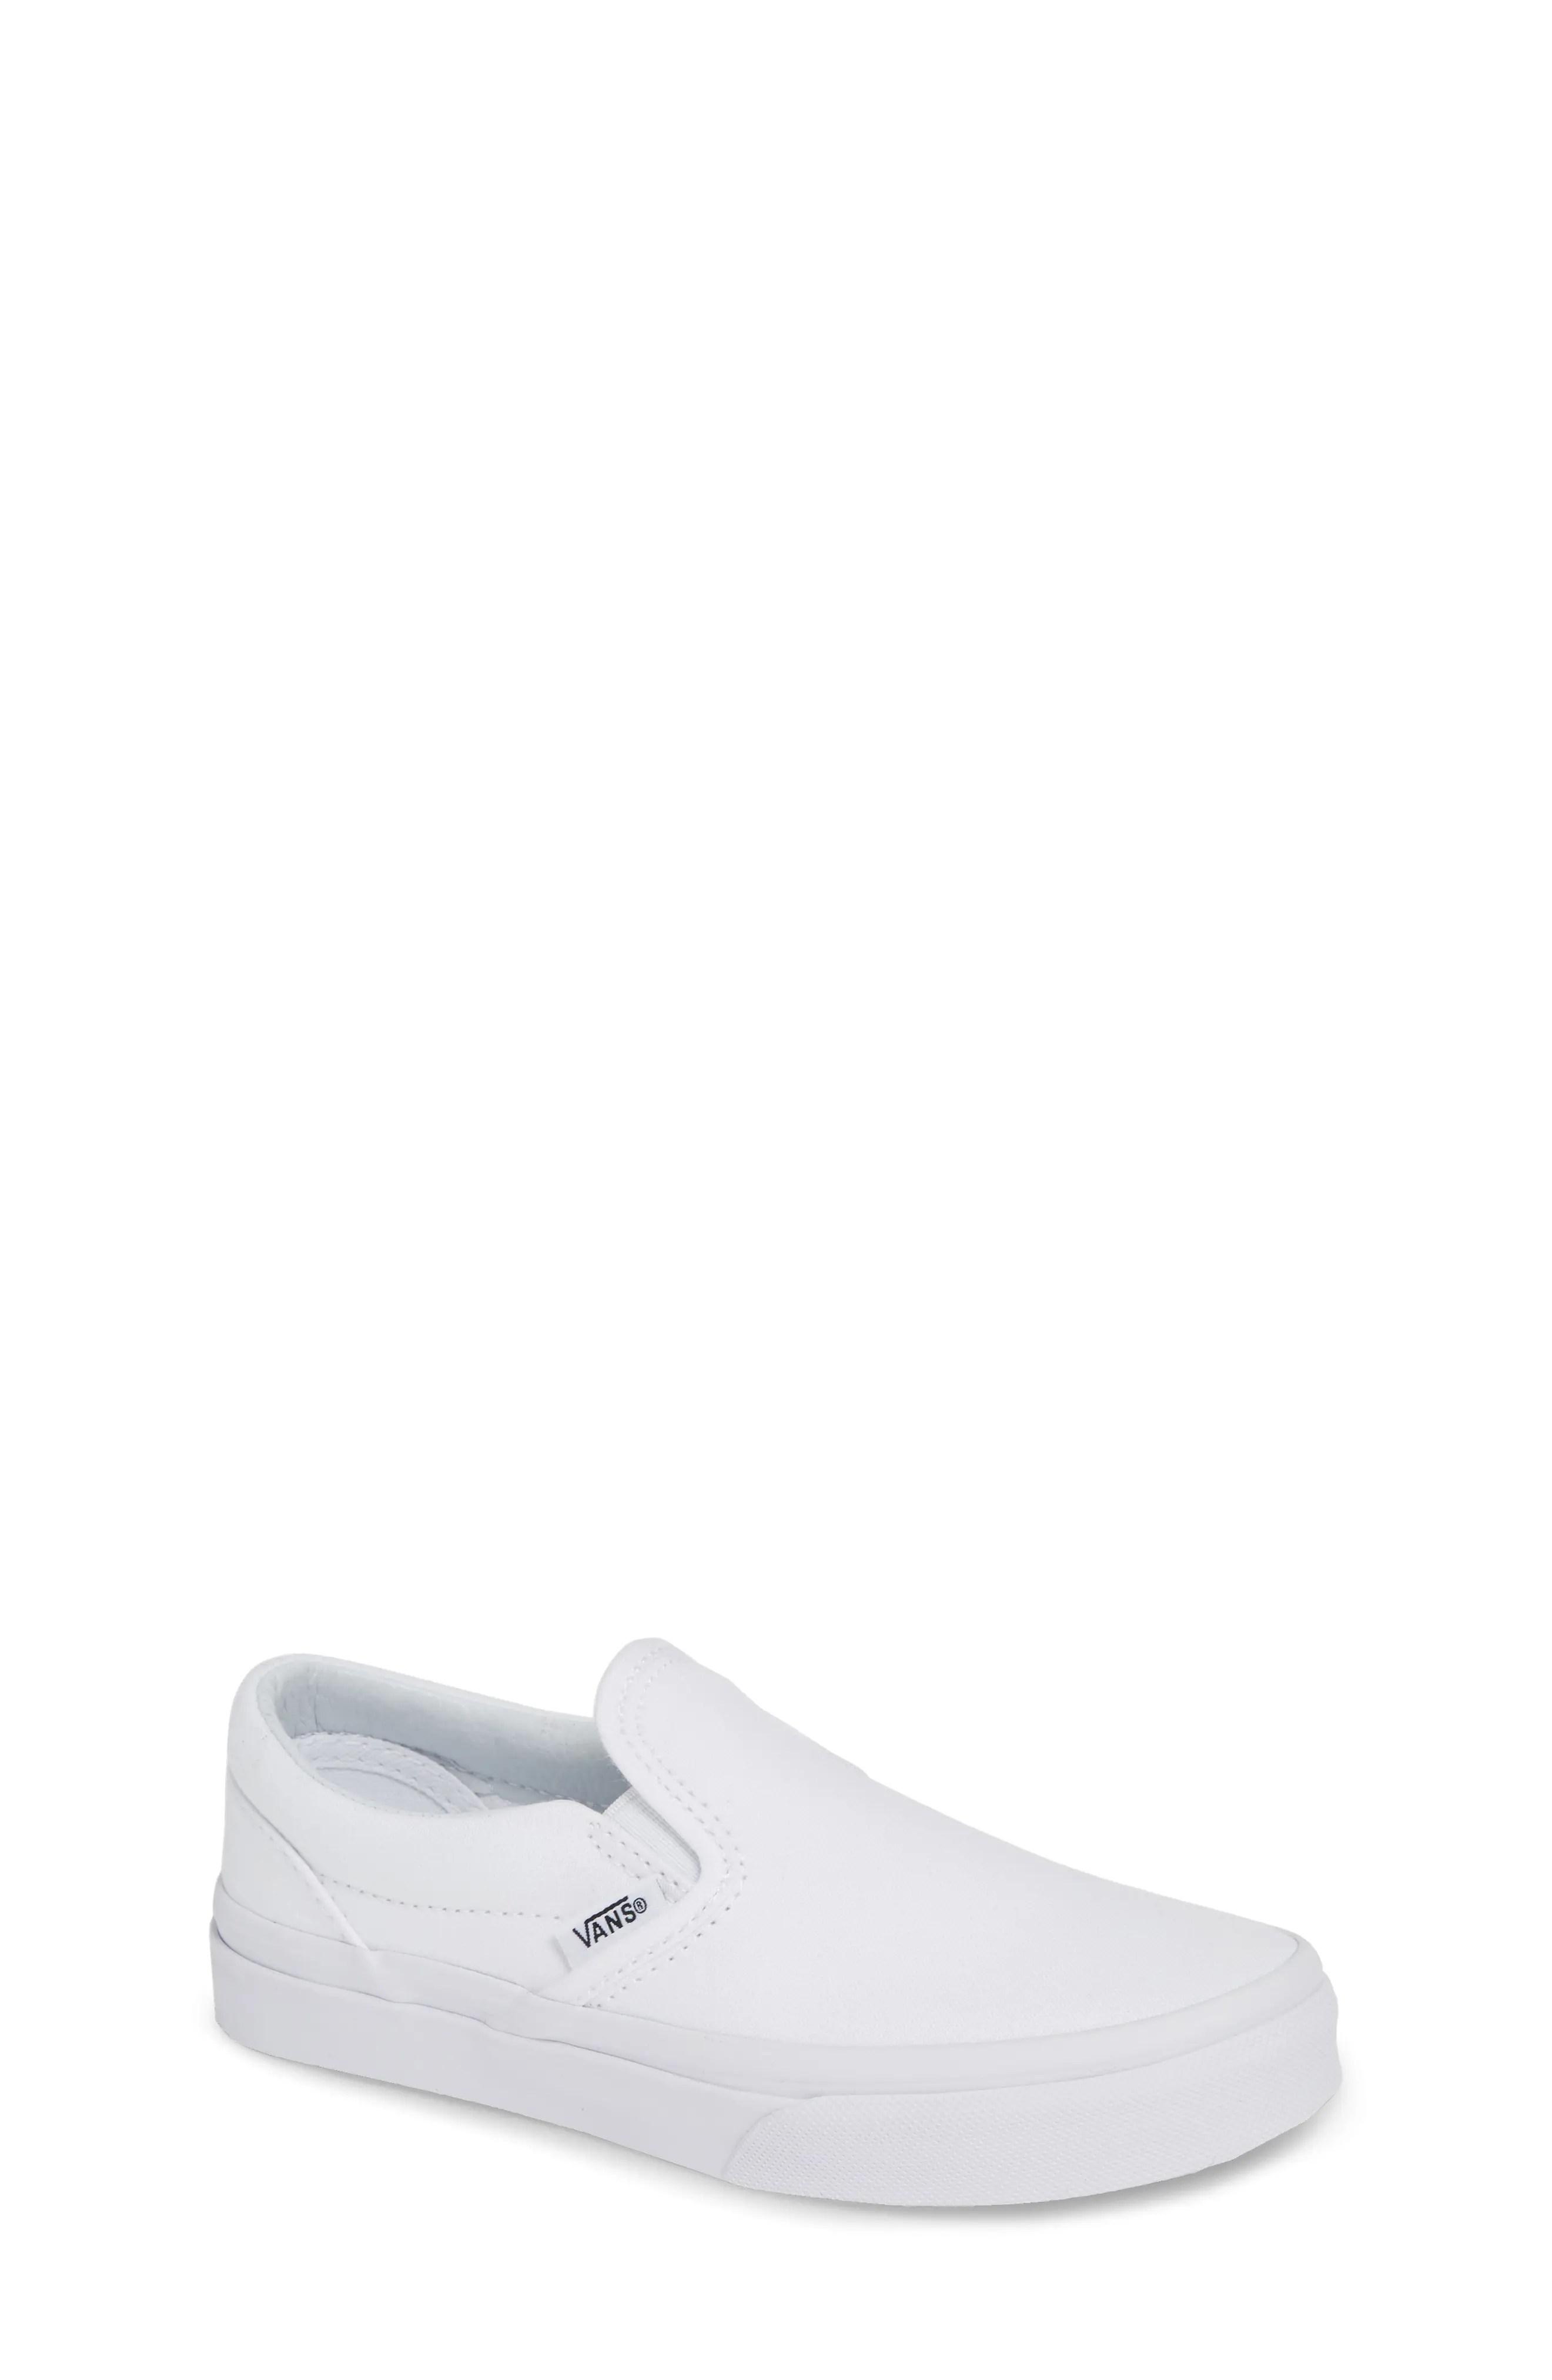 Vans  classic slip on baby walker toddler also little boys shoes sizes nordstrom rh shoprdstrom